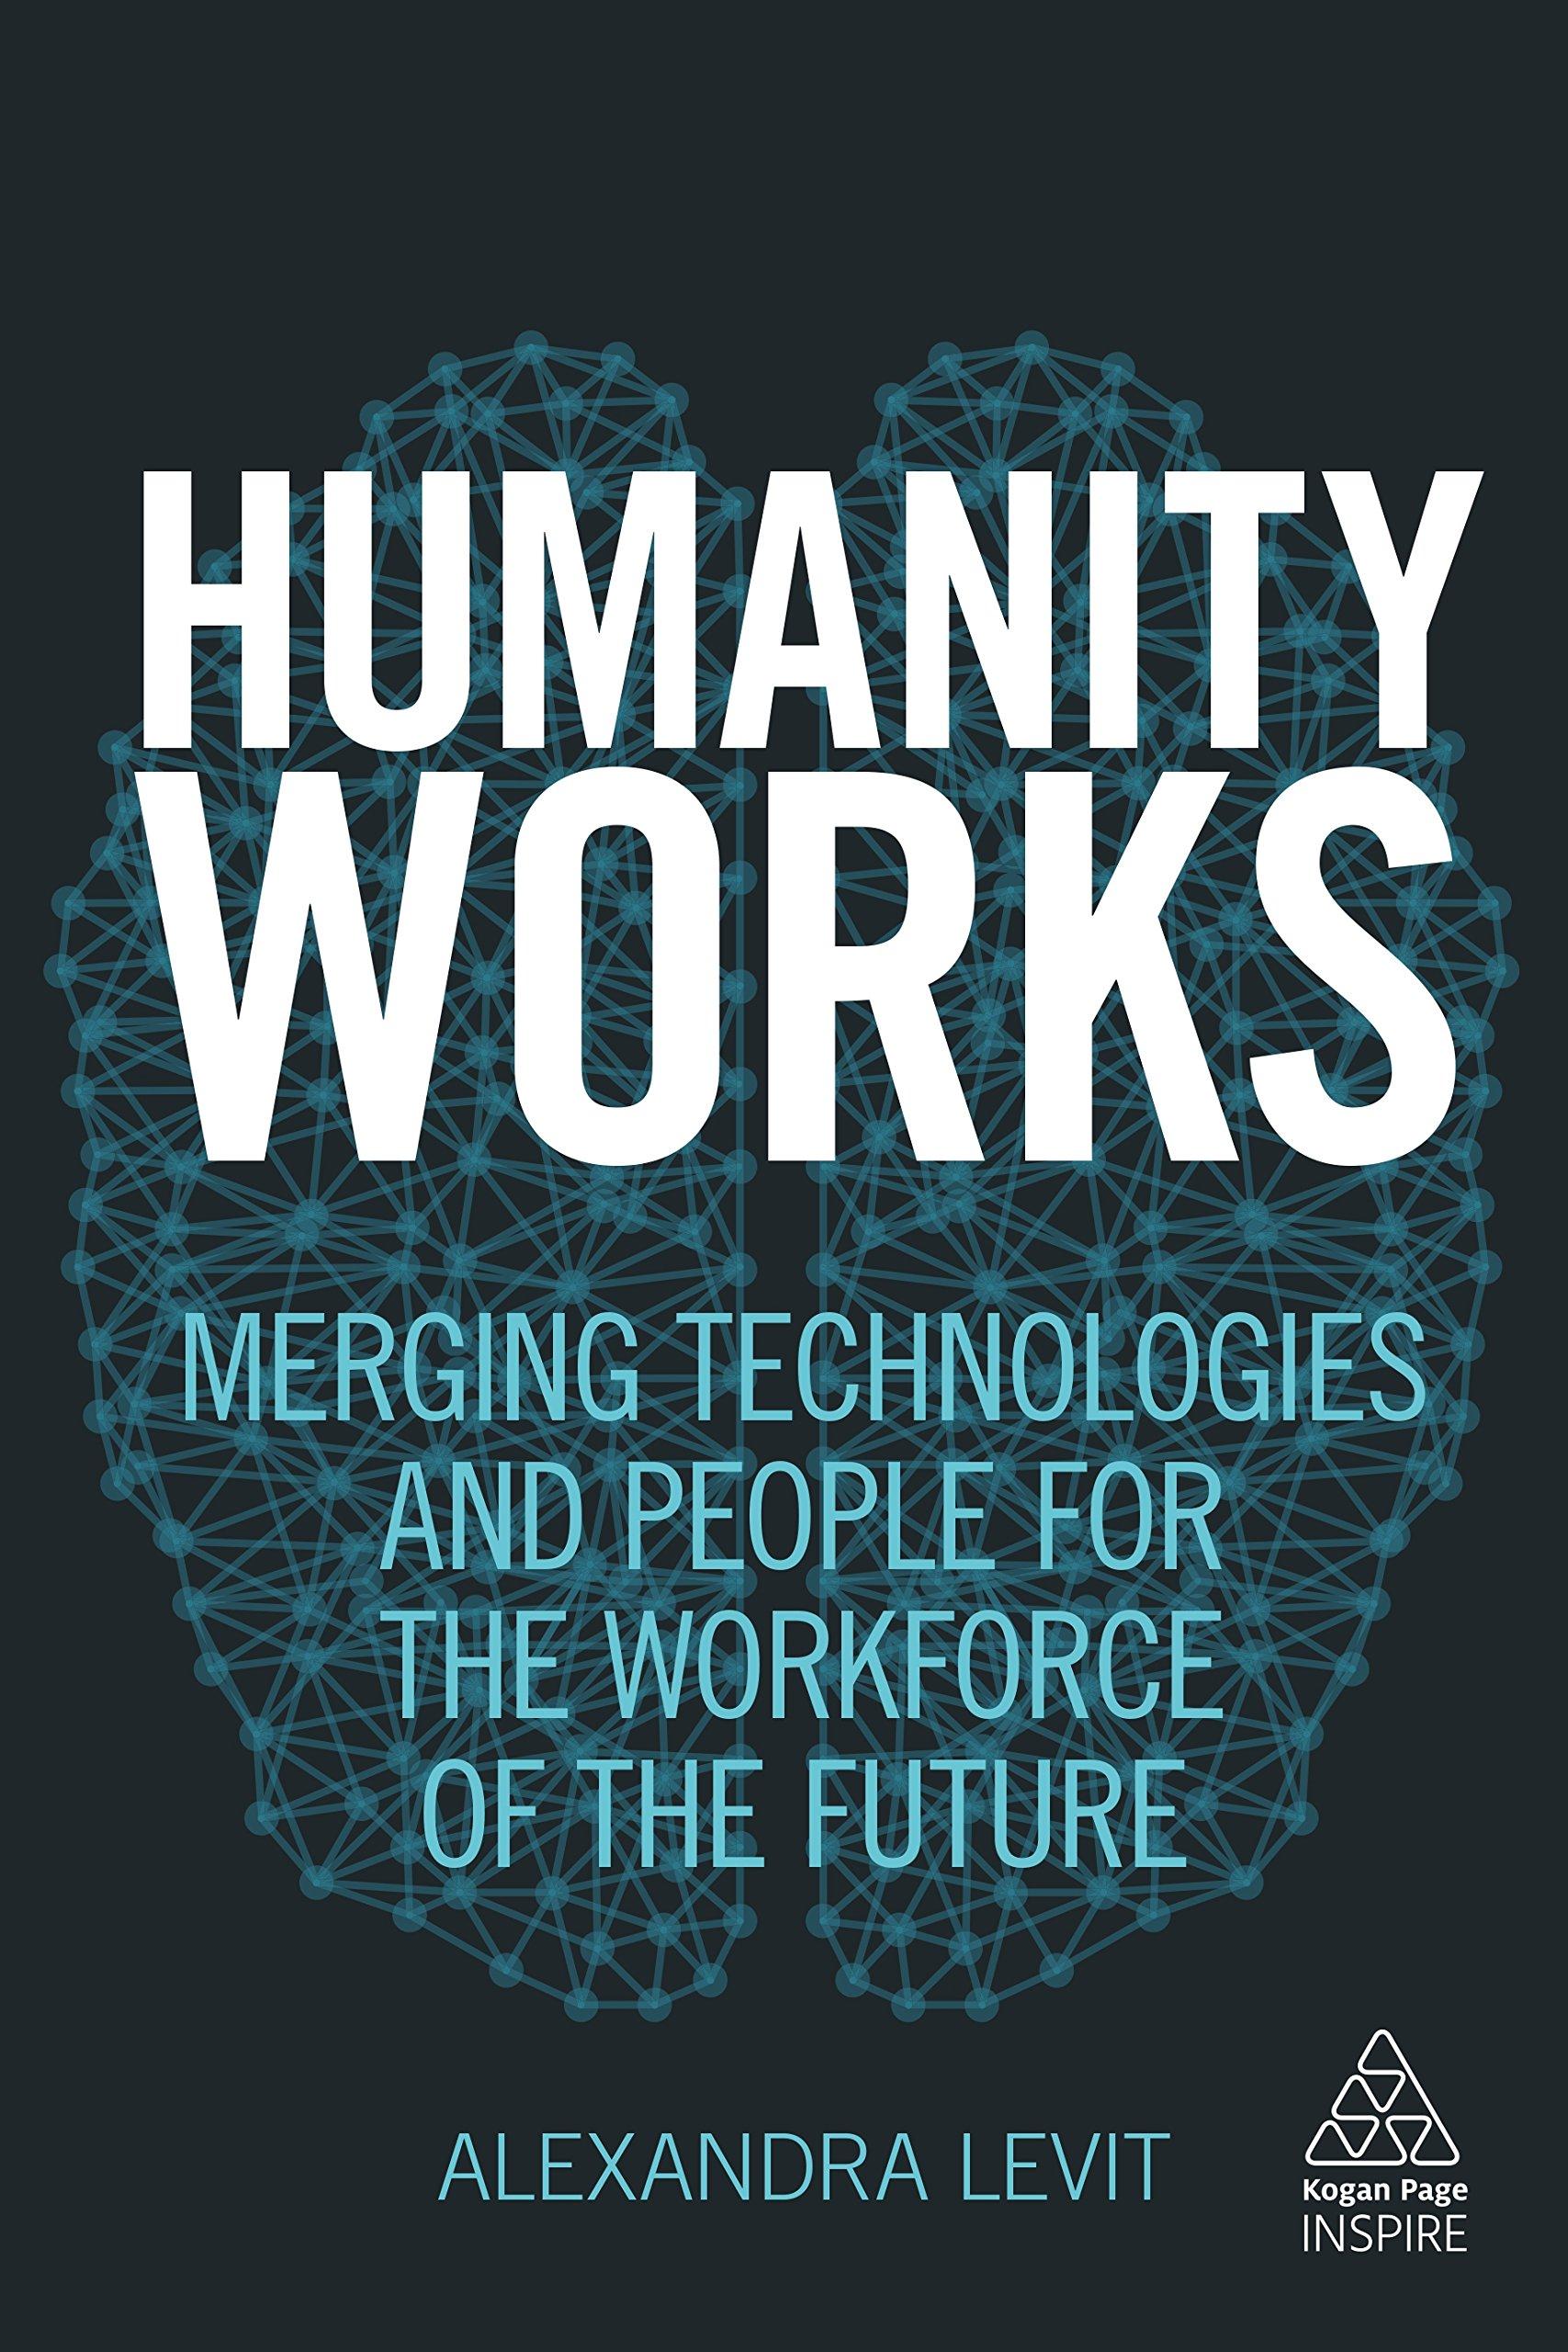 Humanity Works thumbnail